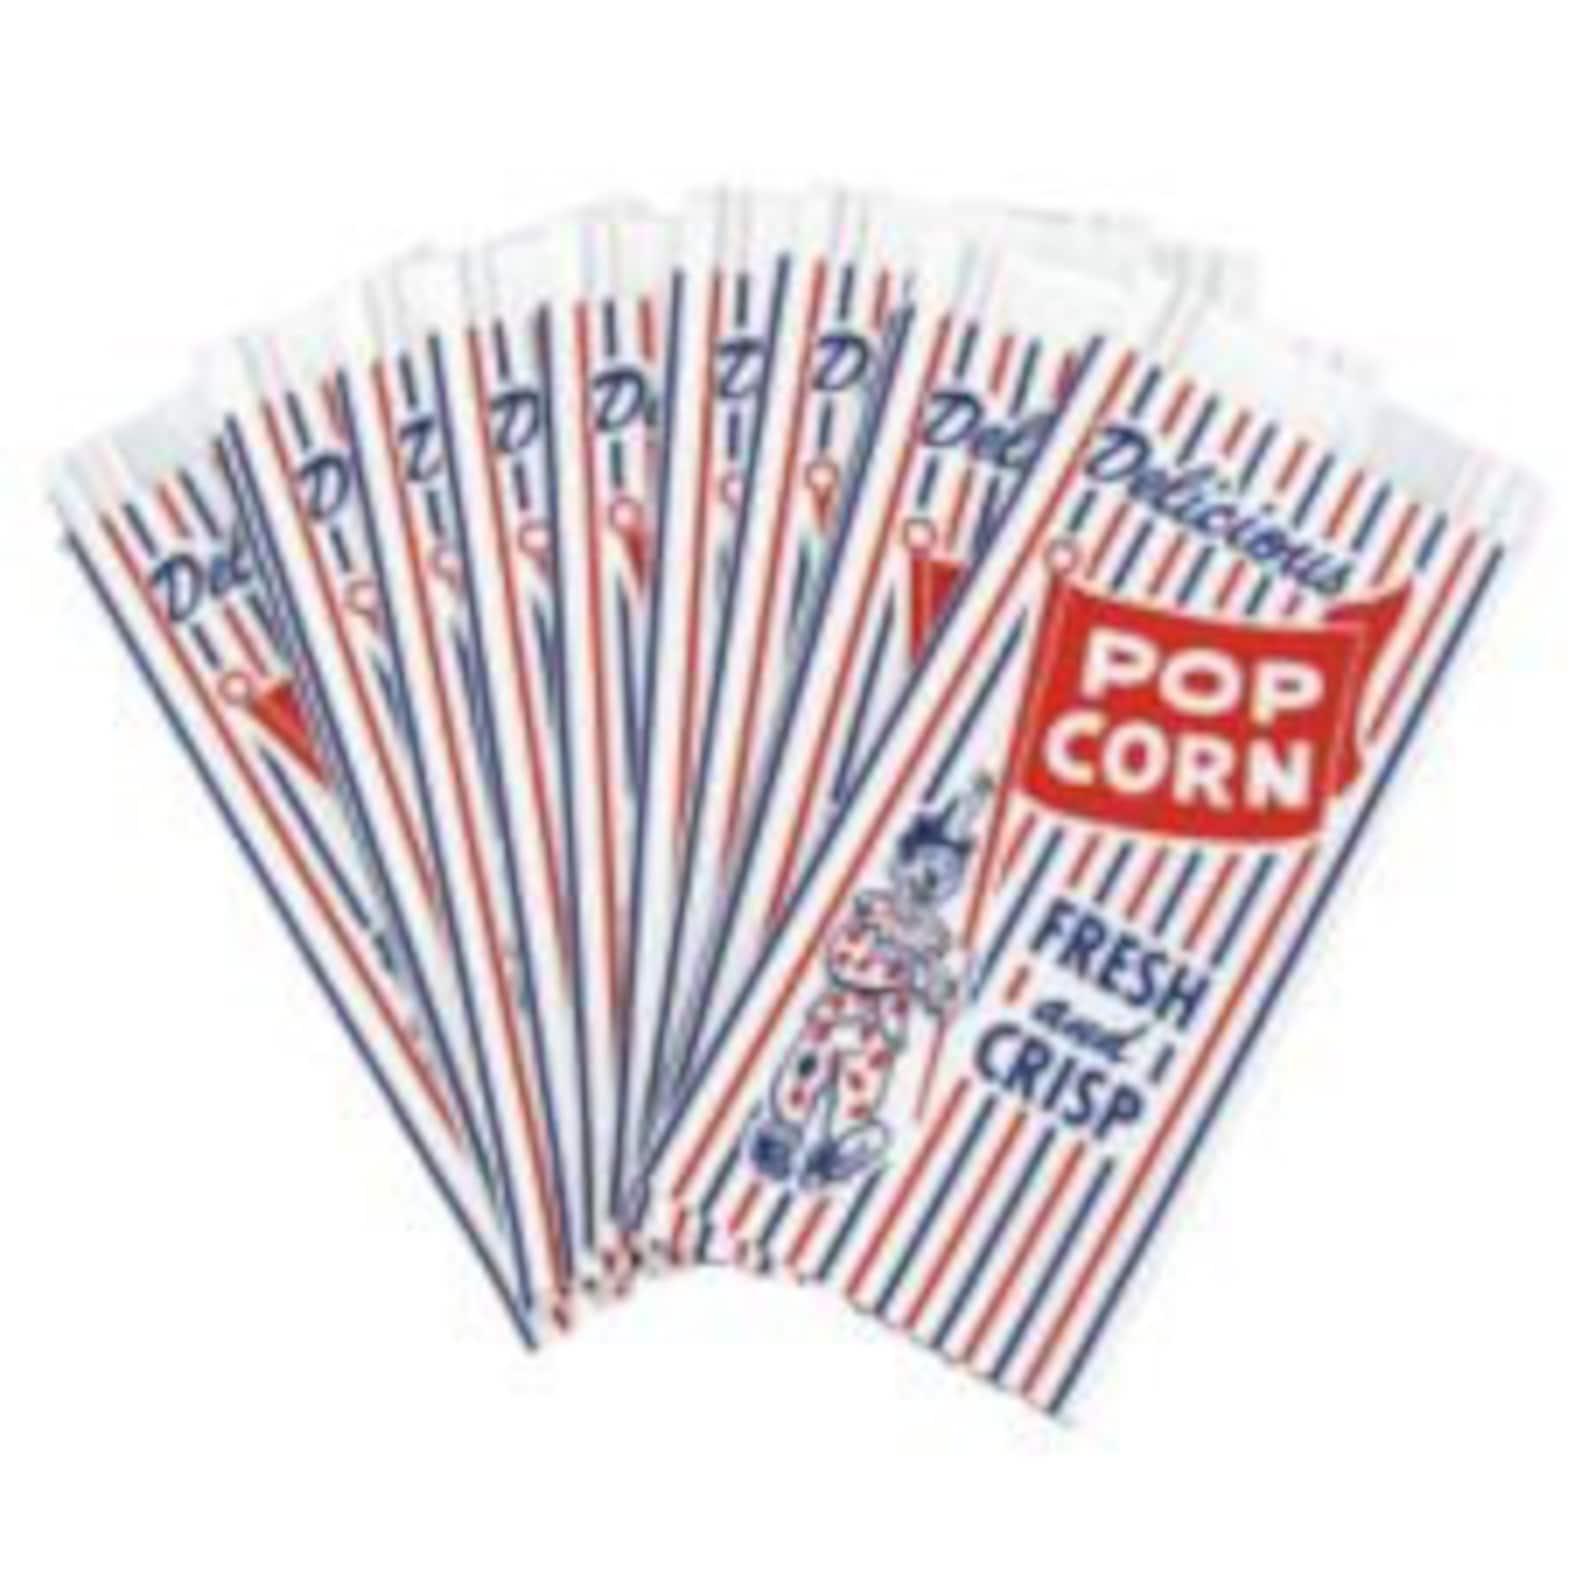 Vintage Style Popcorn Treat Bags